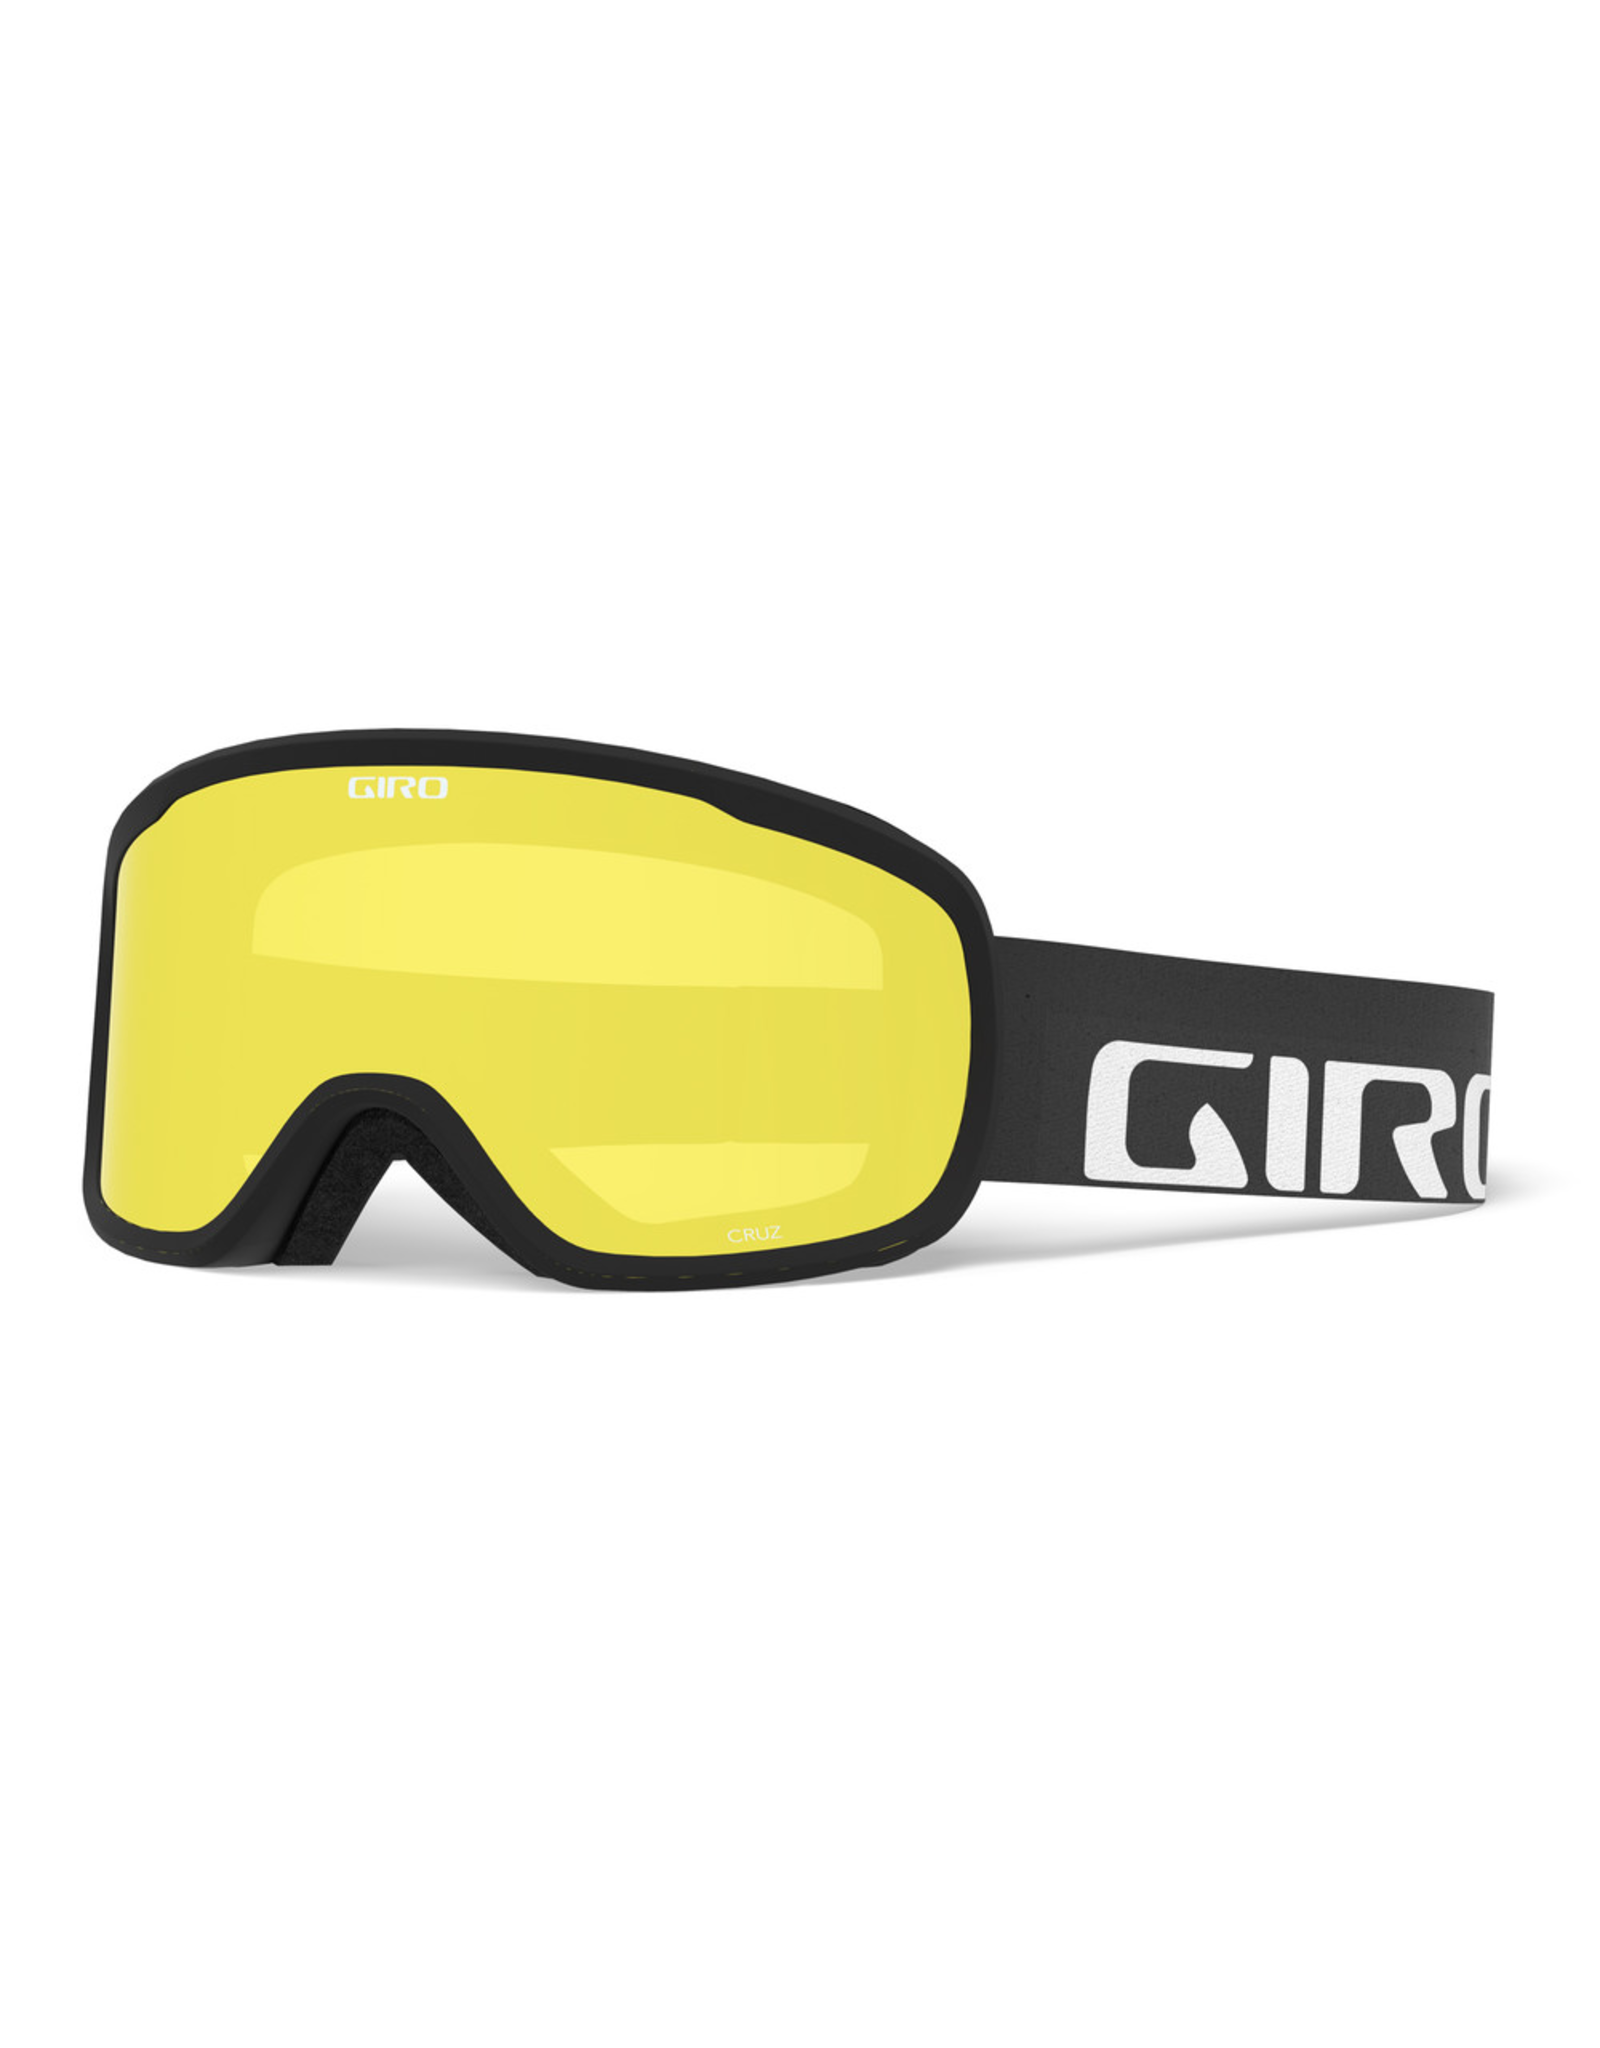 Giro GIRO CRUZ BLACK WDMRK YEL BST SR 20 LUNETTE DE SKI